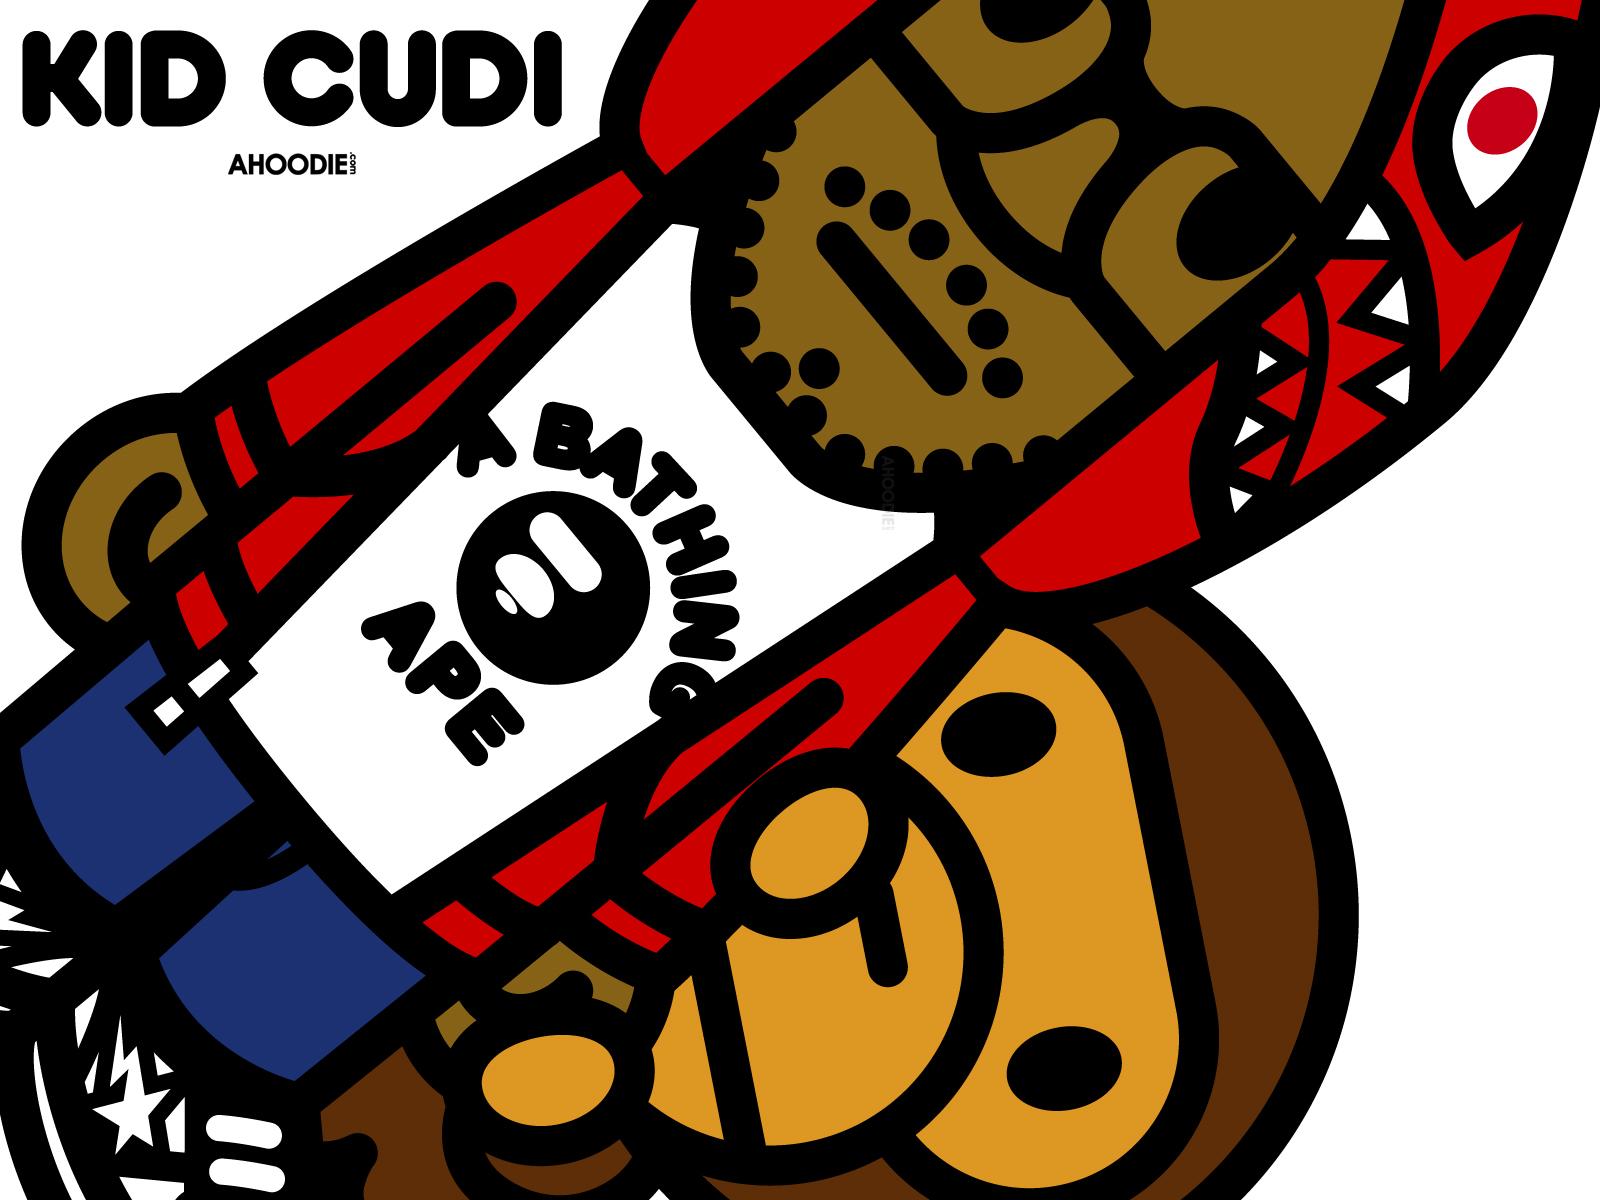 Kid Cudi Bape Baby Milo Wallpaper Desktop Background Logo Quality5jpg 1600x1200